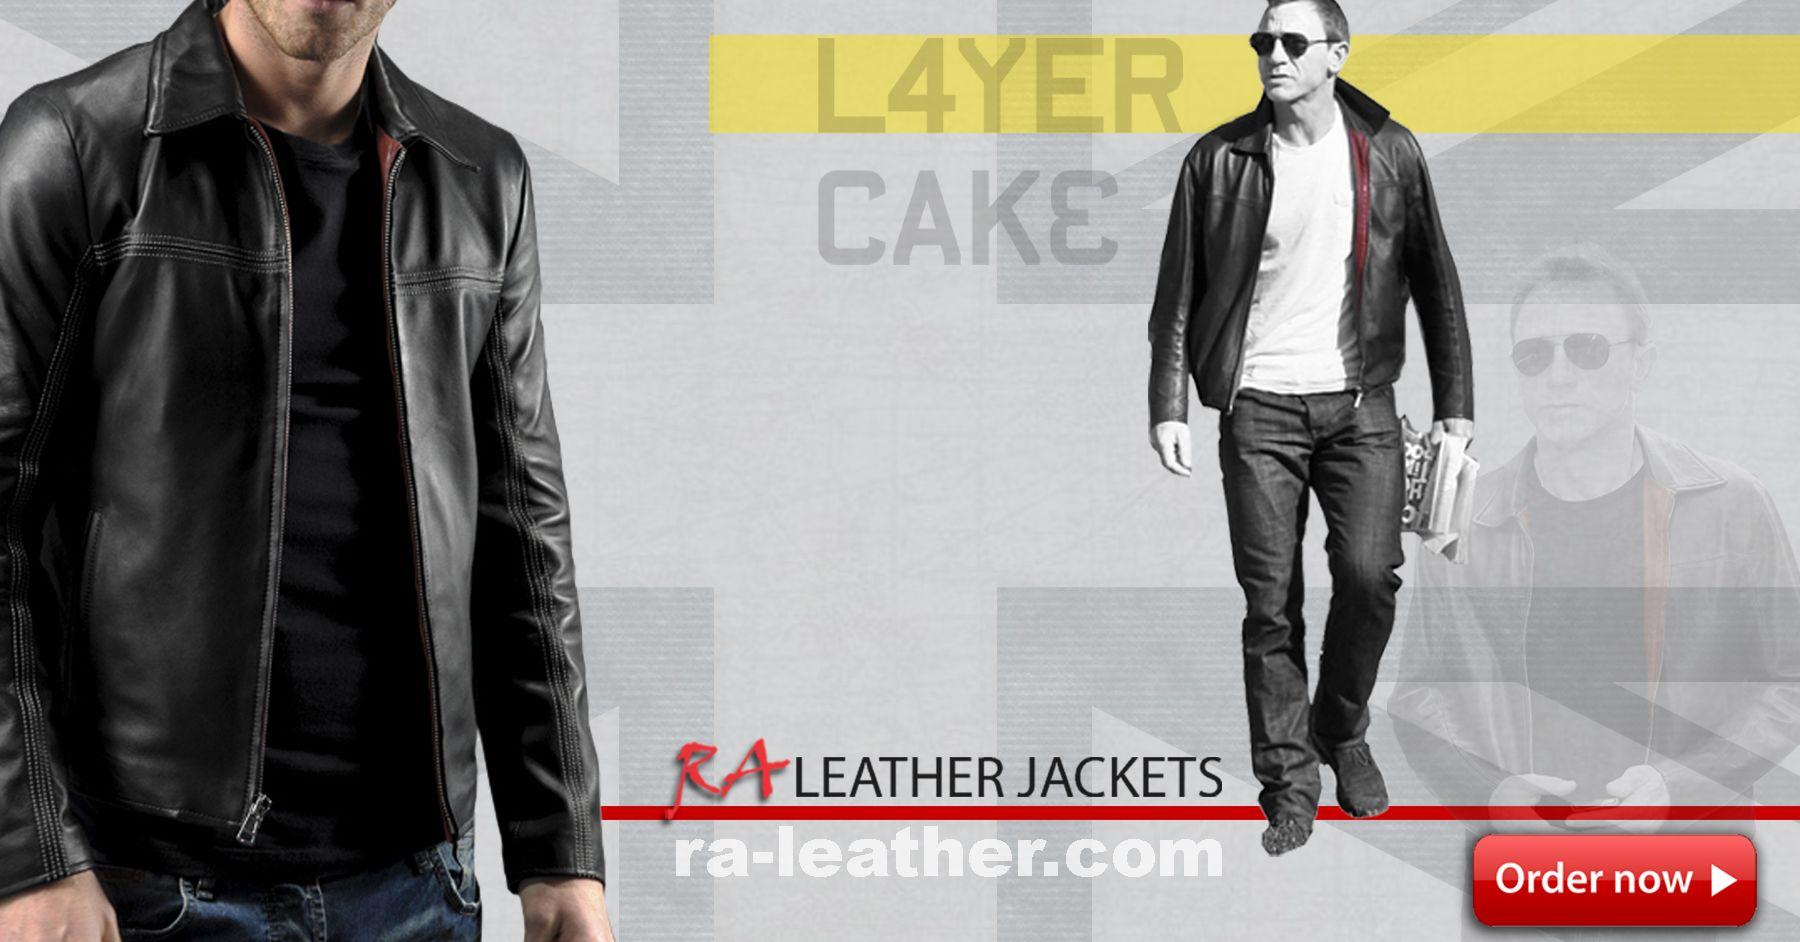 Jaket Kulit Mf1227 Layer Cake Pria Leather Jacket David Black Daniel Craig Di Film Harga Rp 850k